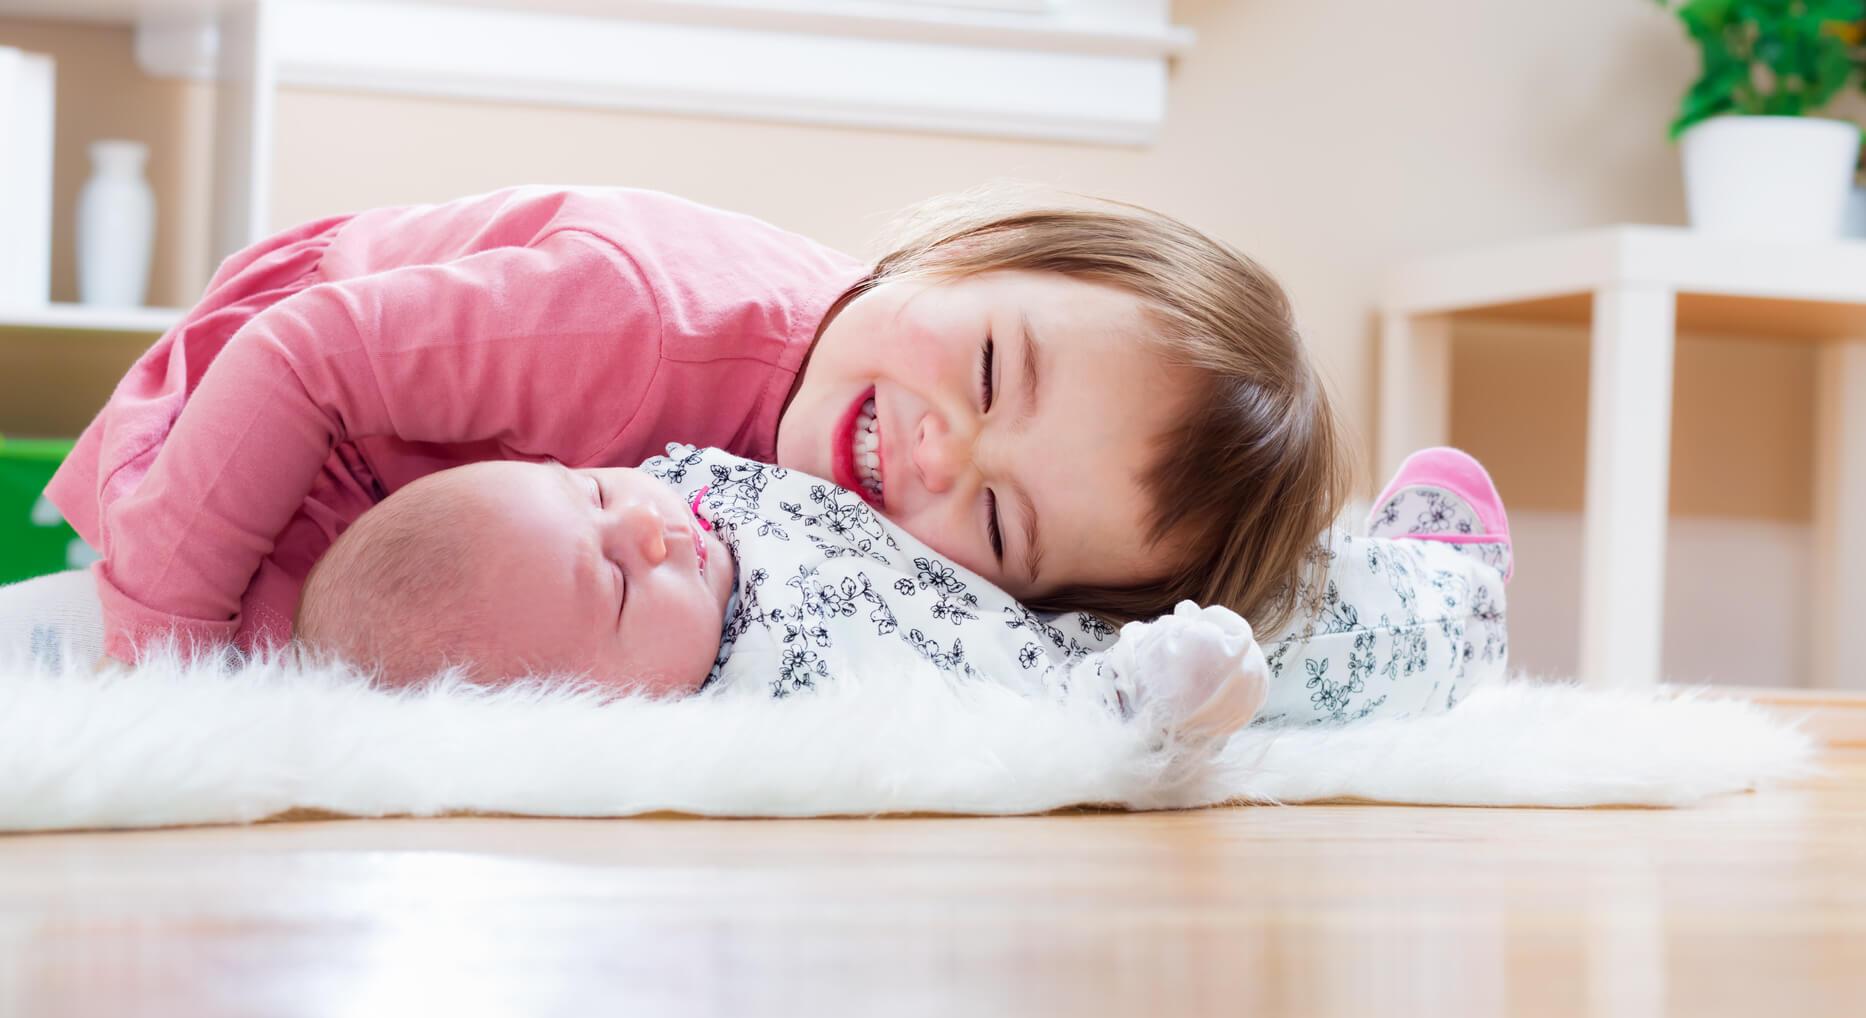 dremitja, gjumi gjate dites, aftesite gjuhesore, si ndikon gjumi ne aftesite gjuhesore